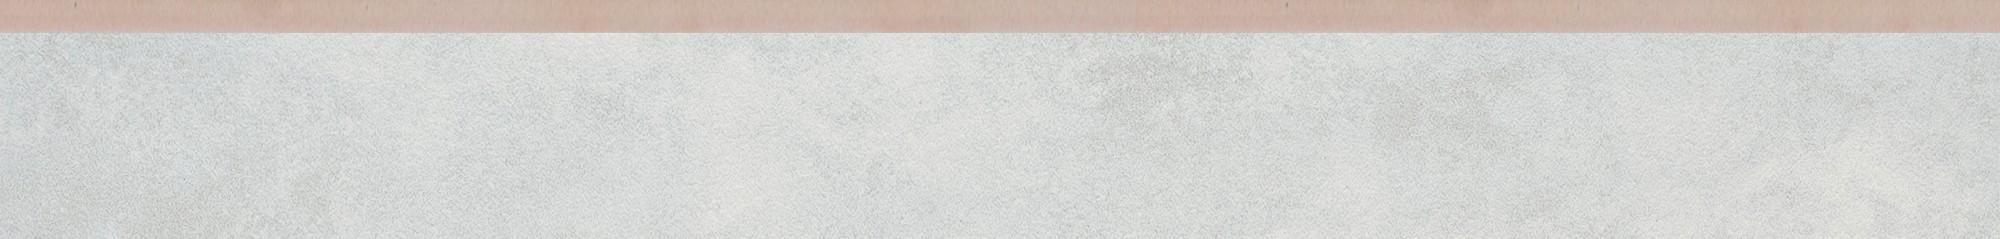 Cokół Cerrad Apenino Bianco  597x80x8,5mm 35777